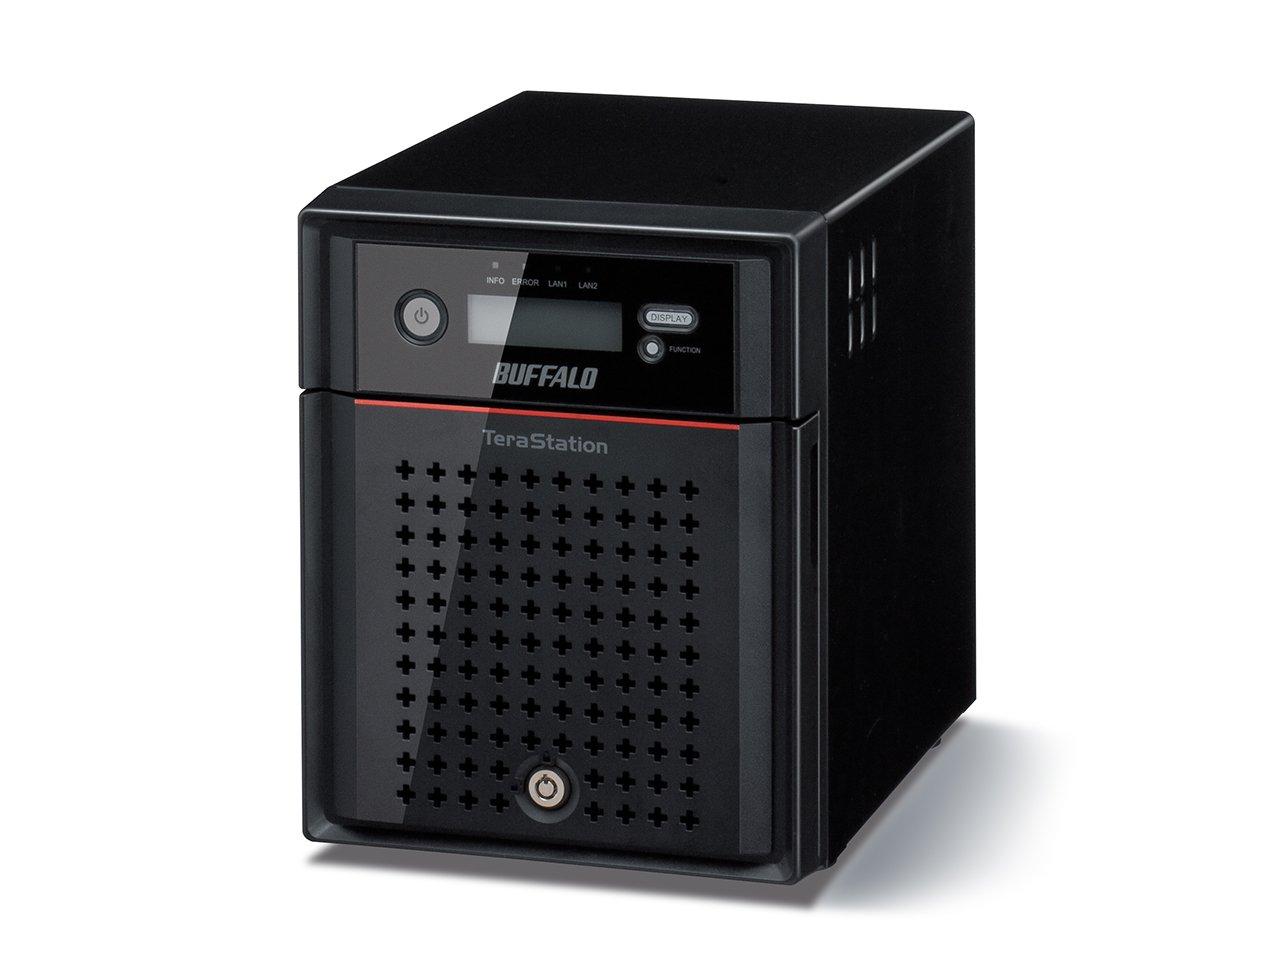 Buffalo TS4400D NAS Drivers Windows XP